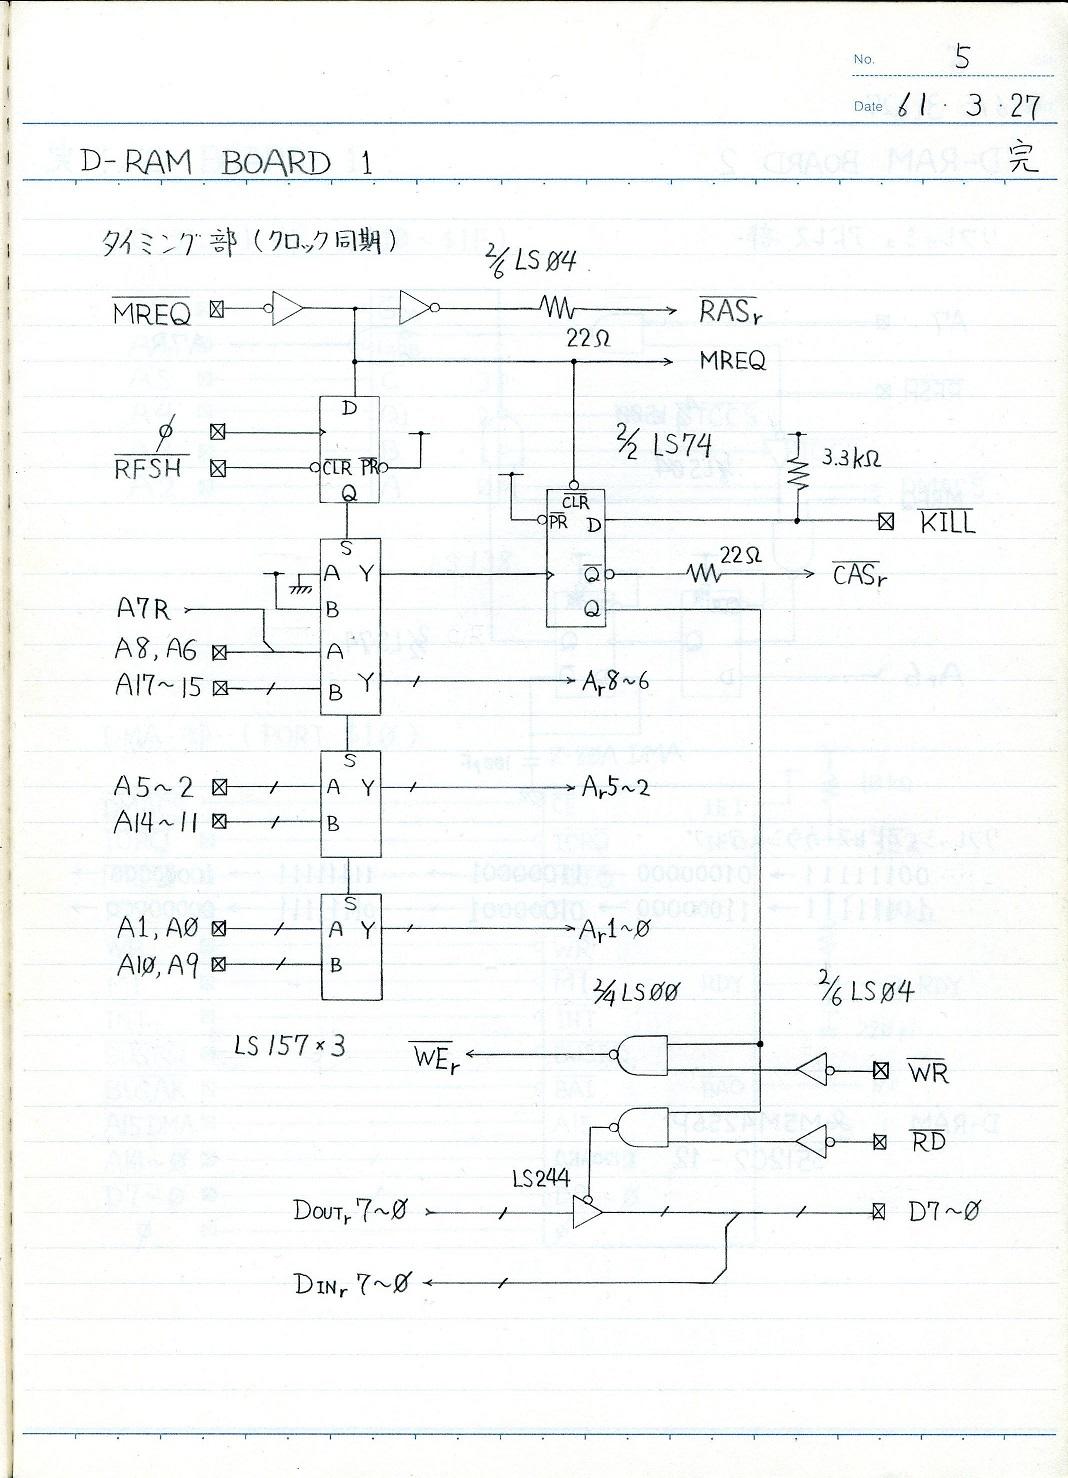 D-RAM board circuit 1